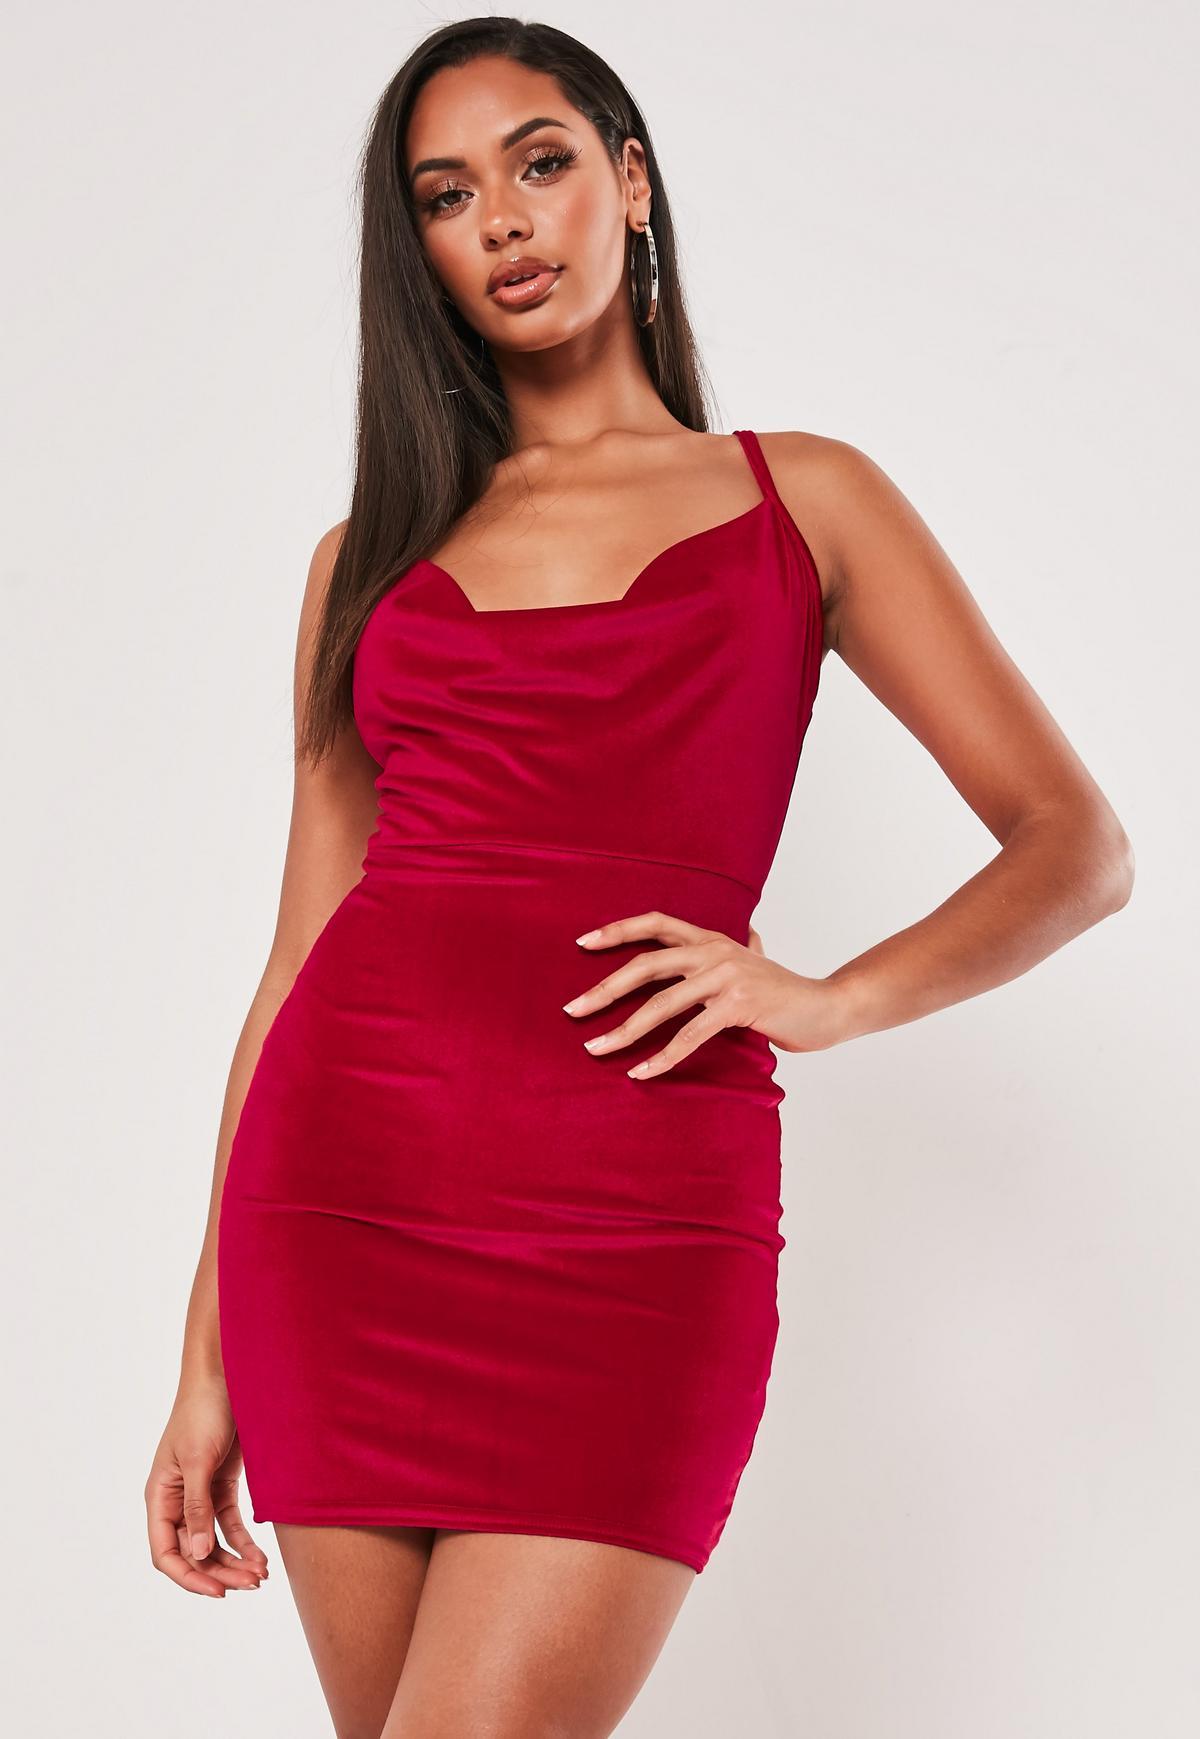 Fonkelnieuw Red Velvet Strappy Cowl Neck Mini Dress   Missguided WA-92